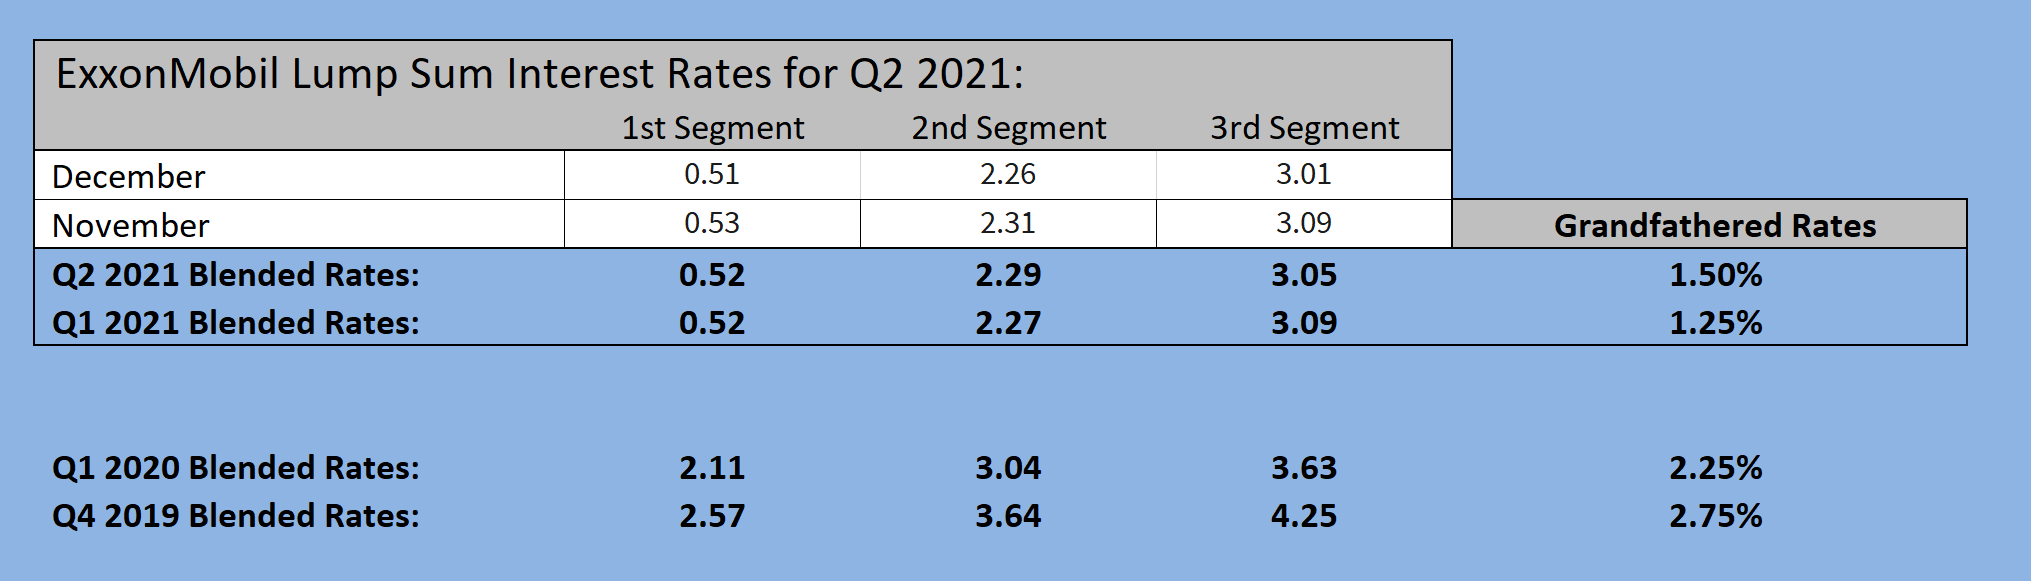 XOM Interest Rates 1-22-21